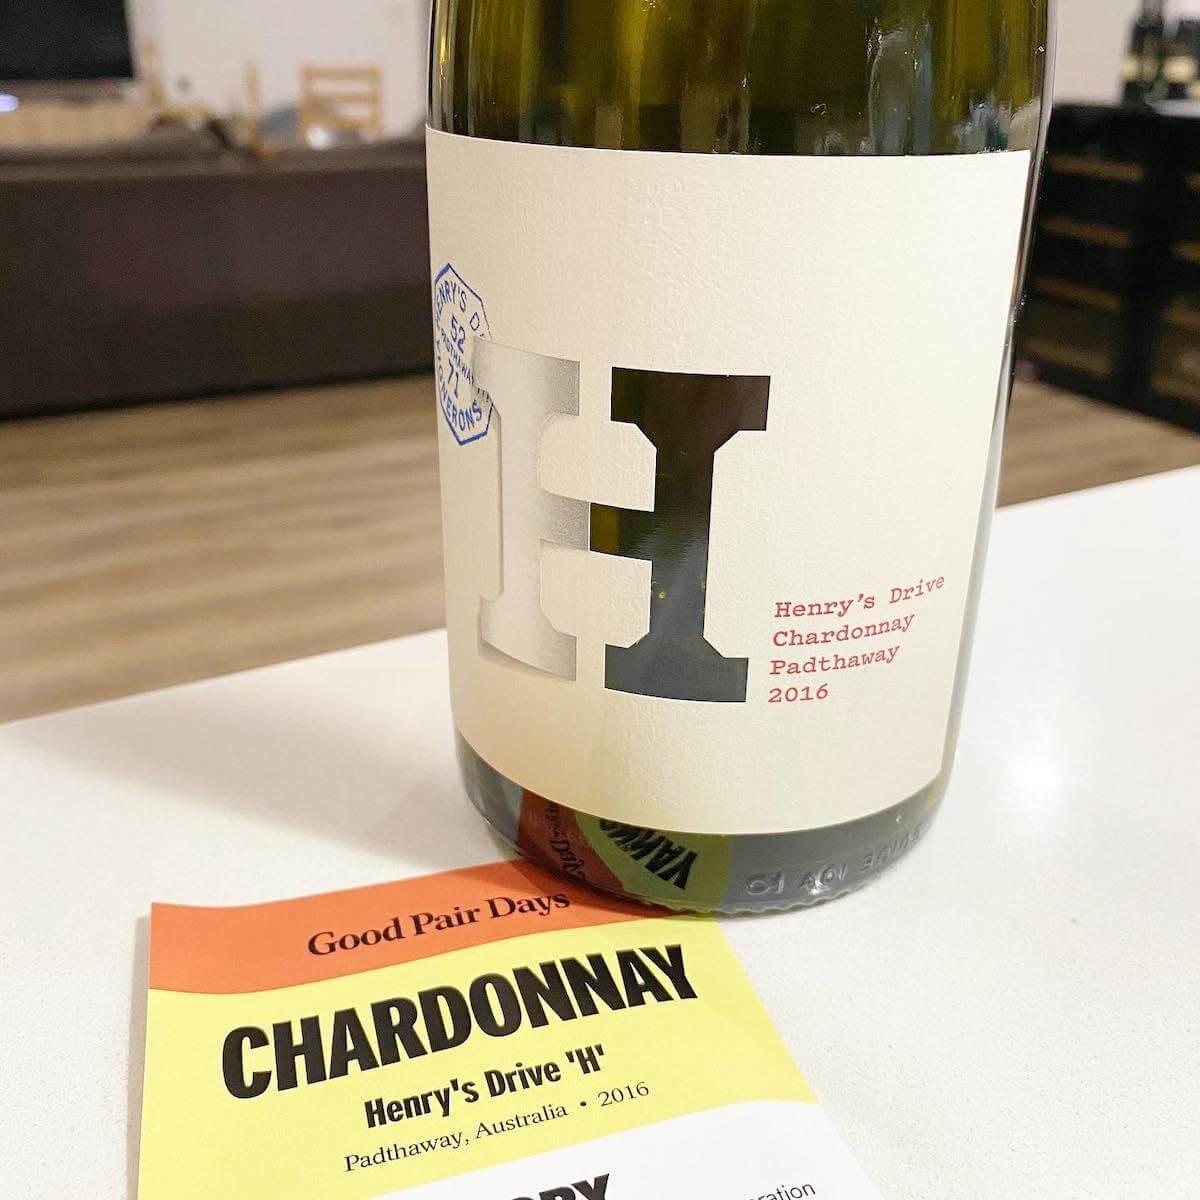 Henry's Drive 'H' 2016 Chardonnay – Padthaway